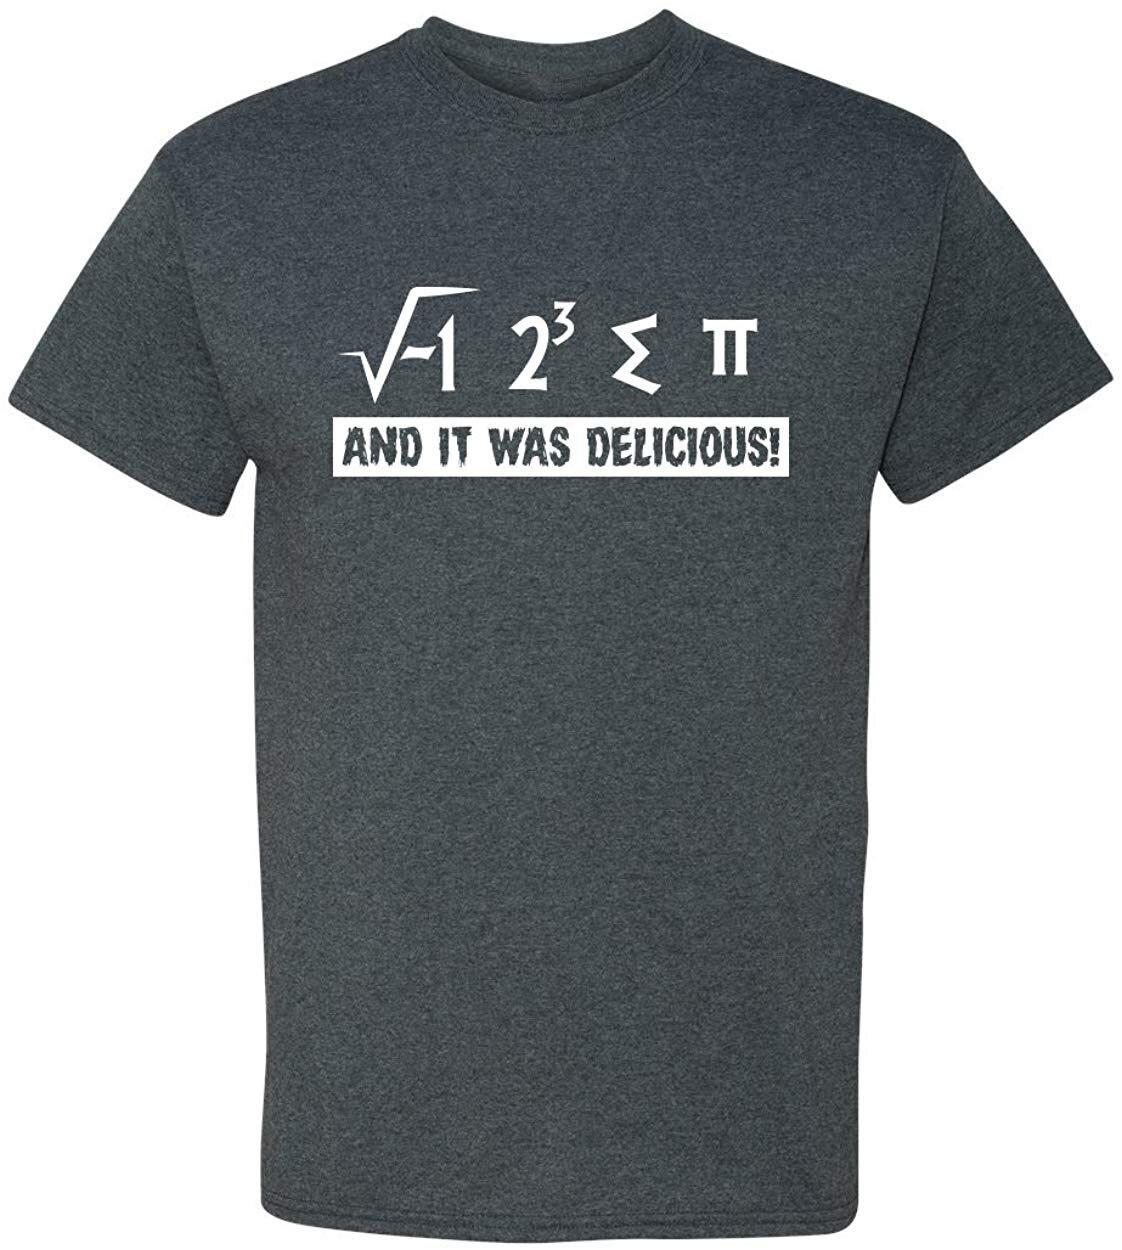 I Ate Some Pi And It Was Delicious Funny Math Pun 3,14 adulto hombres Humor camiseta hombres mujeres al aire libre desgaste Tops camiseta